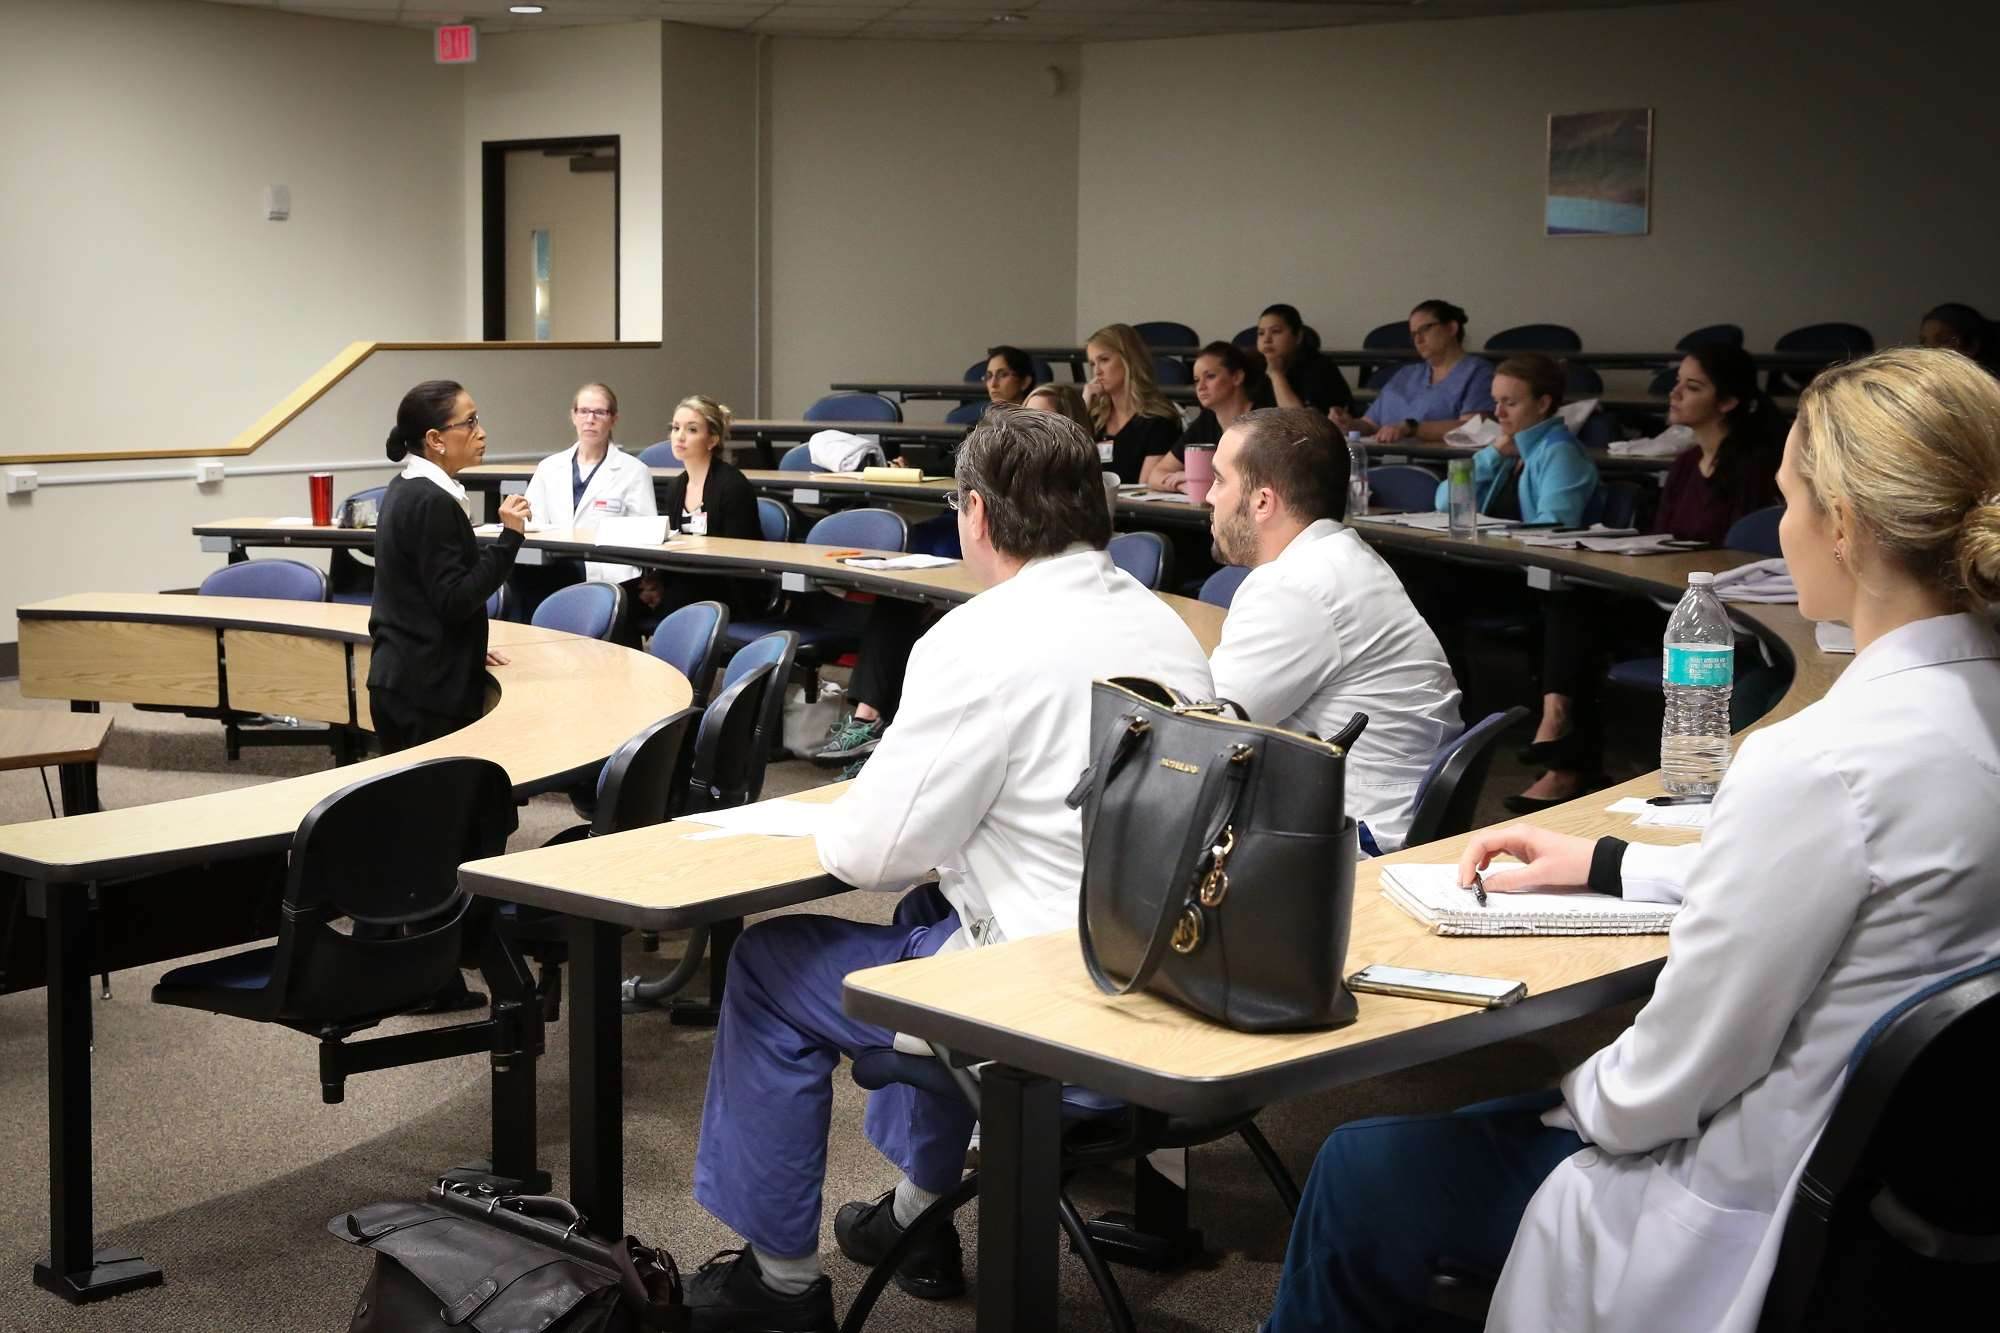 We Promot Lifelong Learning | UTMB School of Nursing